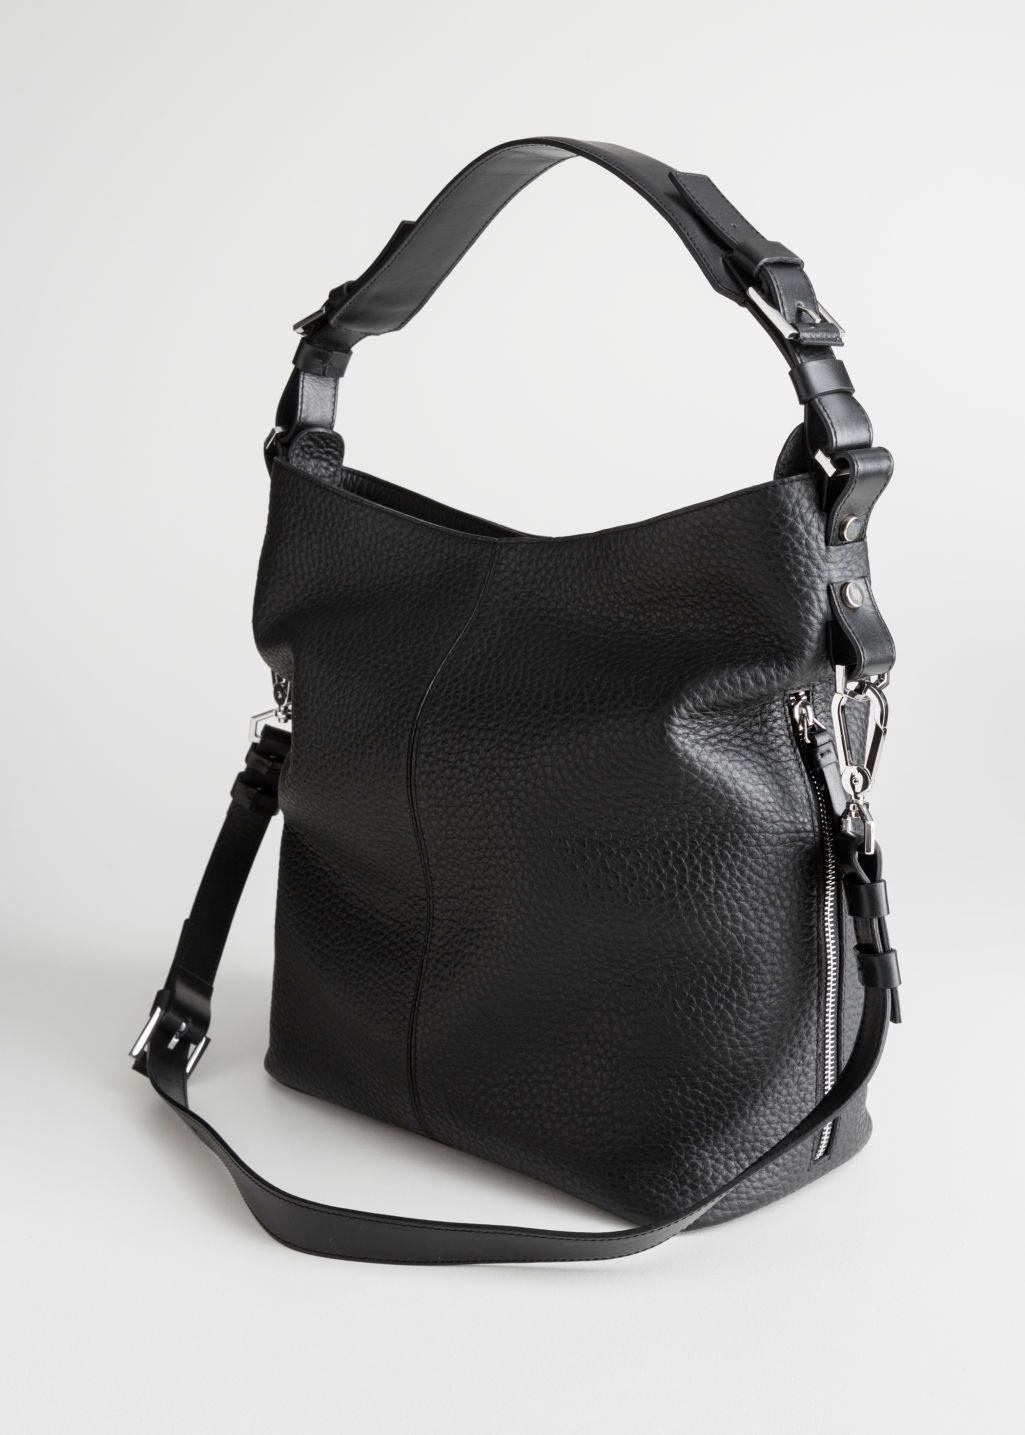 Grain Leather Hobo Bag Leather Hobo Bag Hobo Bag Leather Crossbody Bag